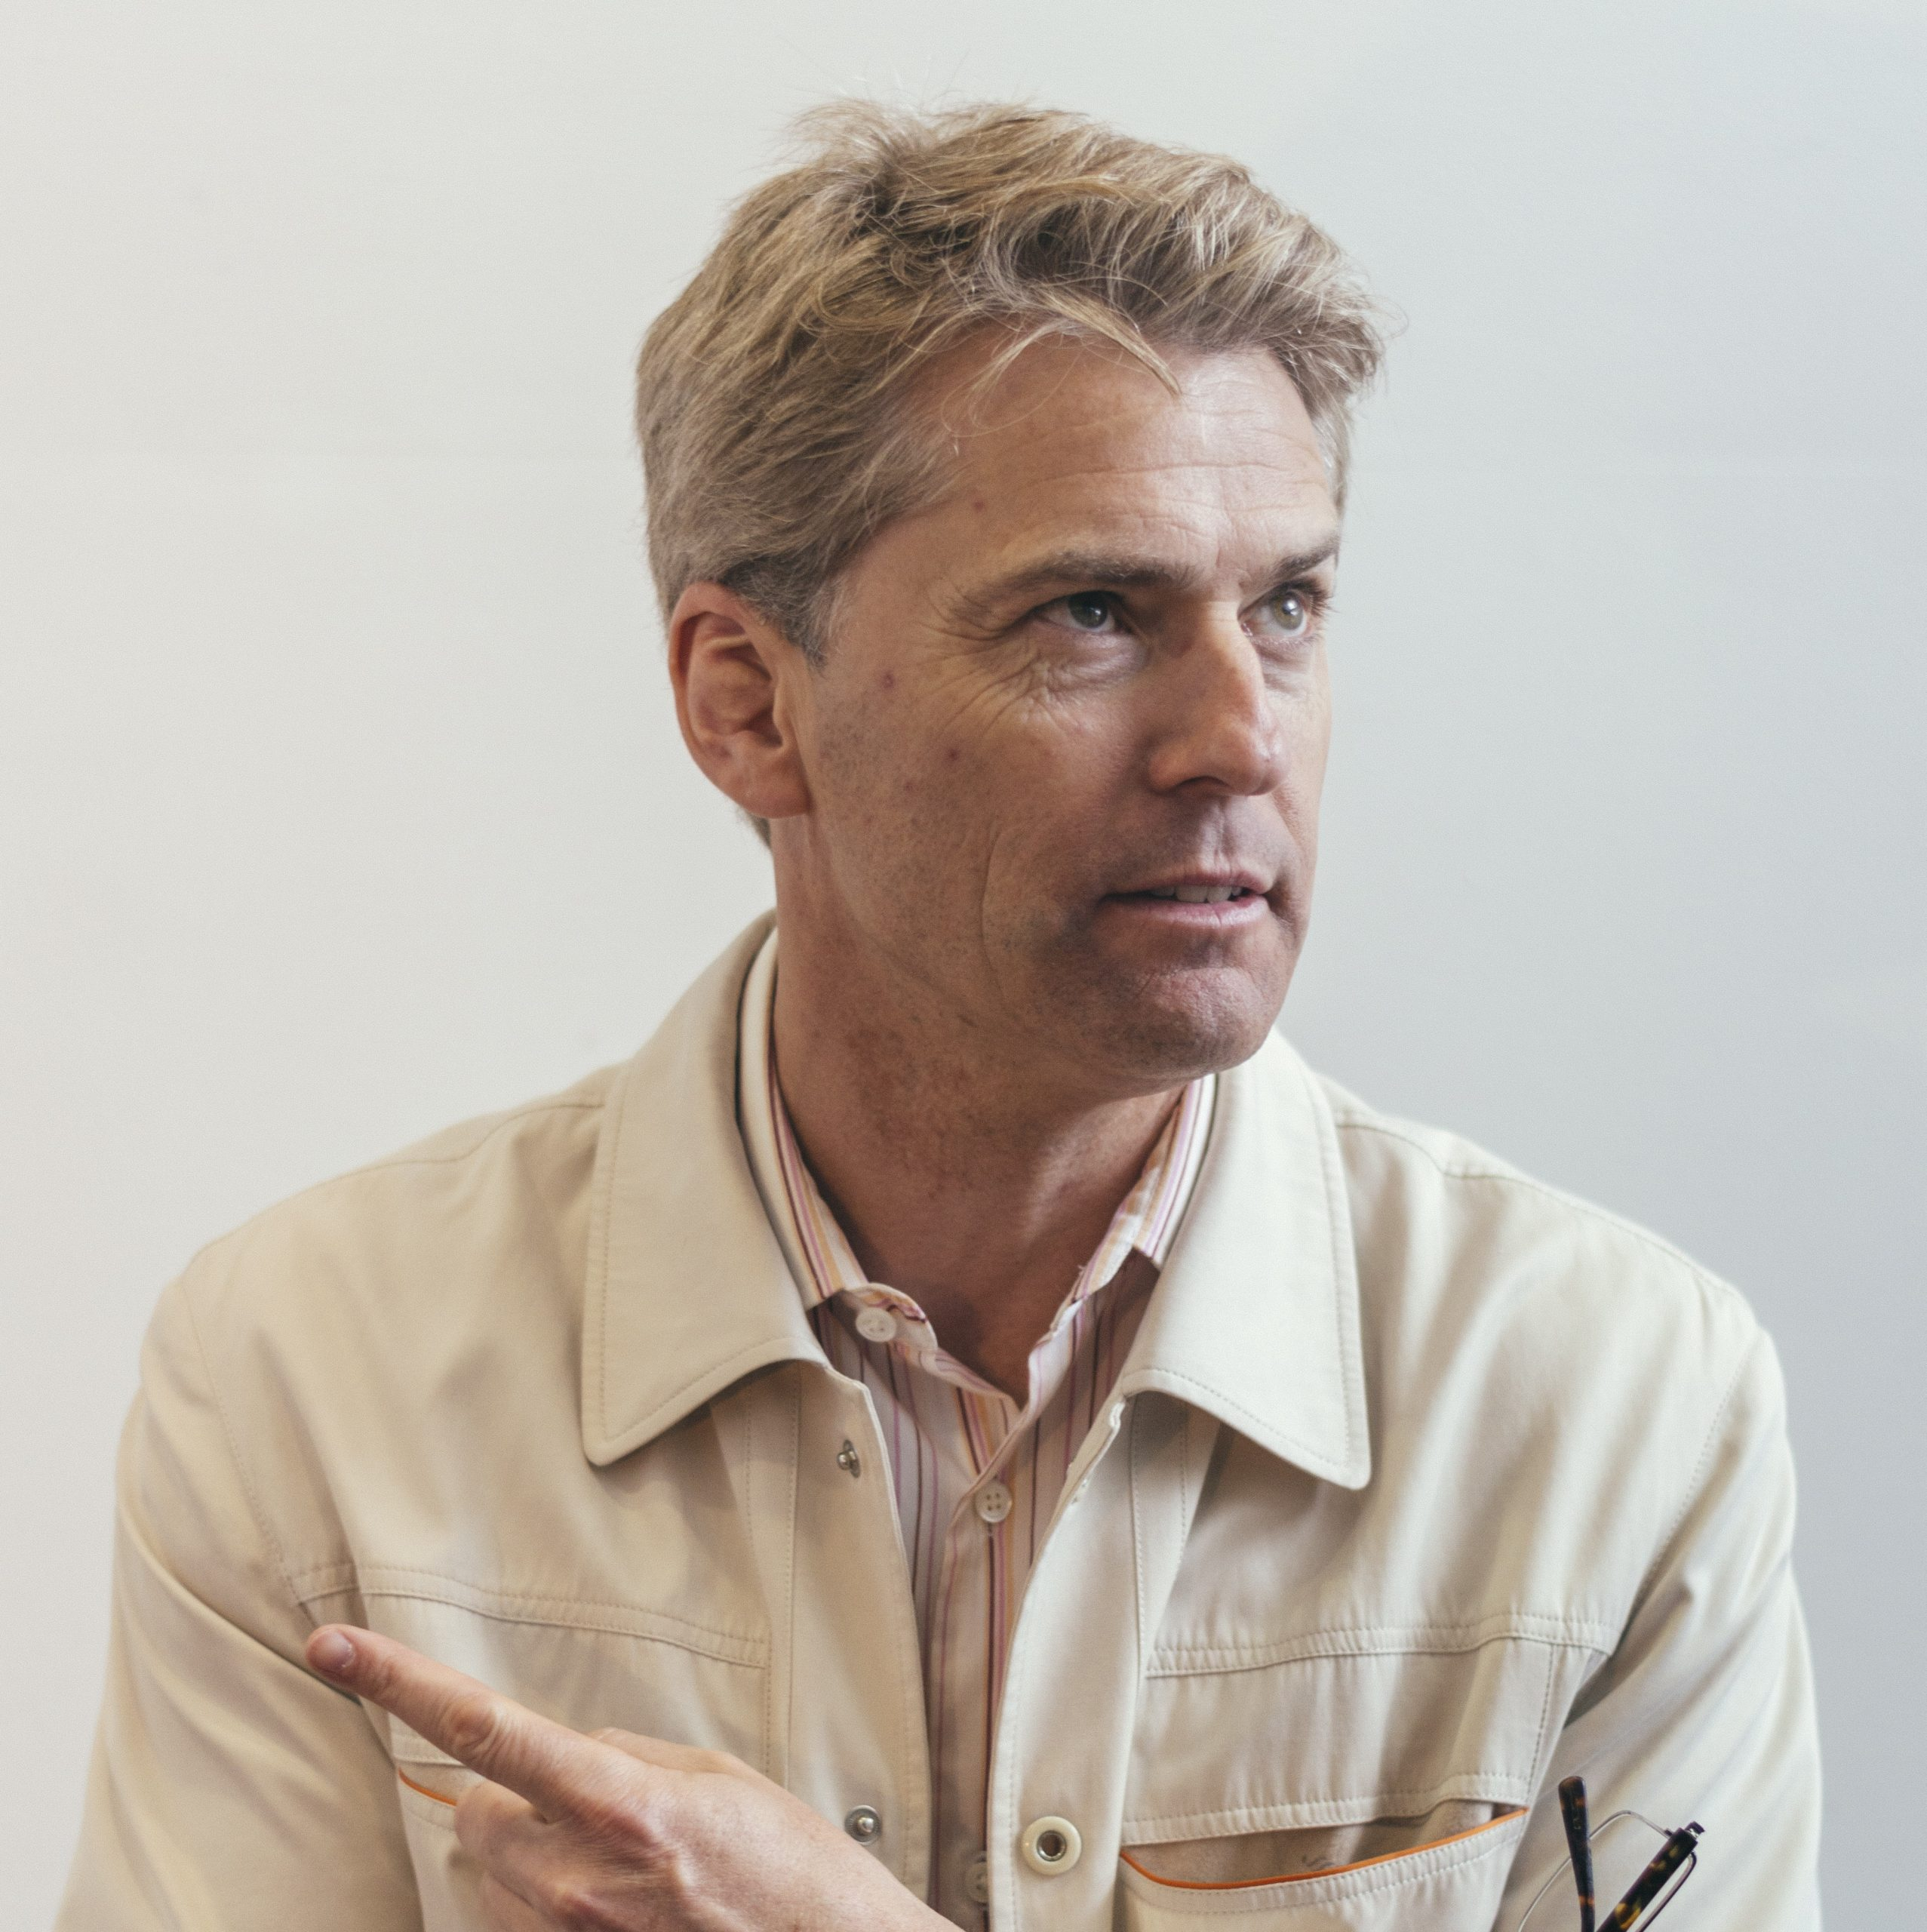 Jon-Paul Walden